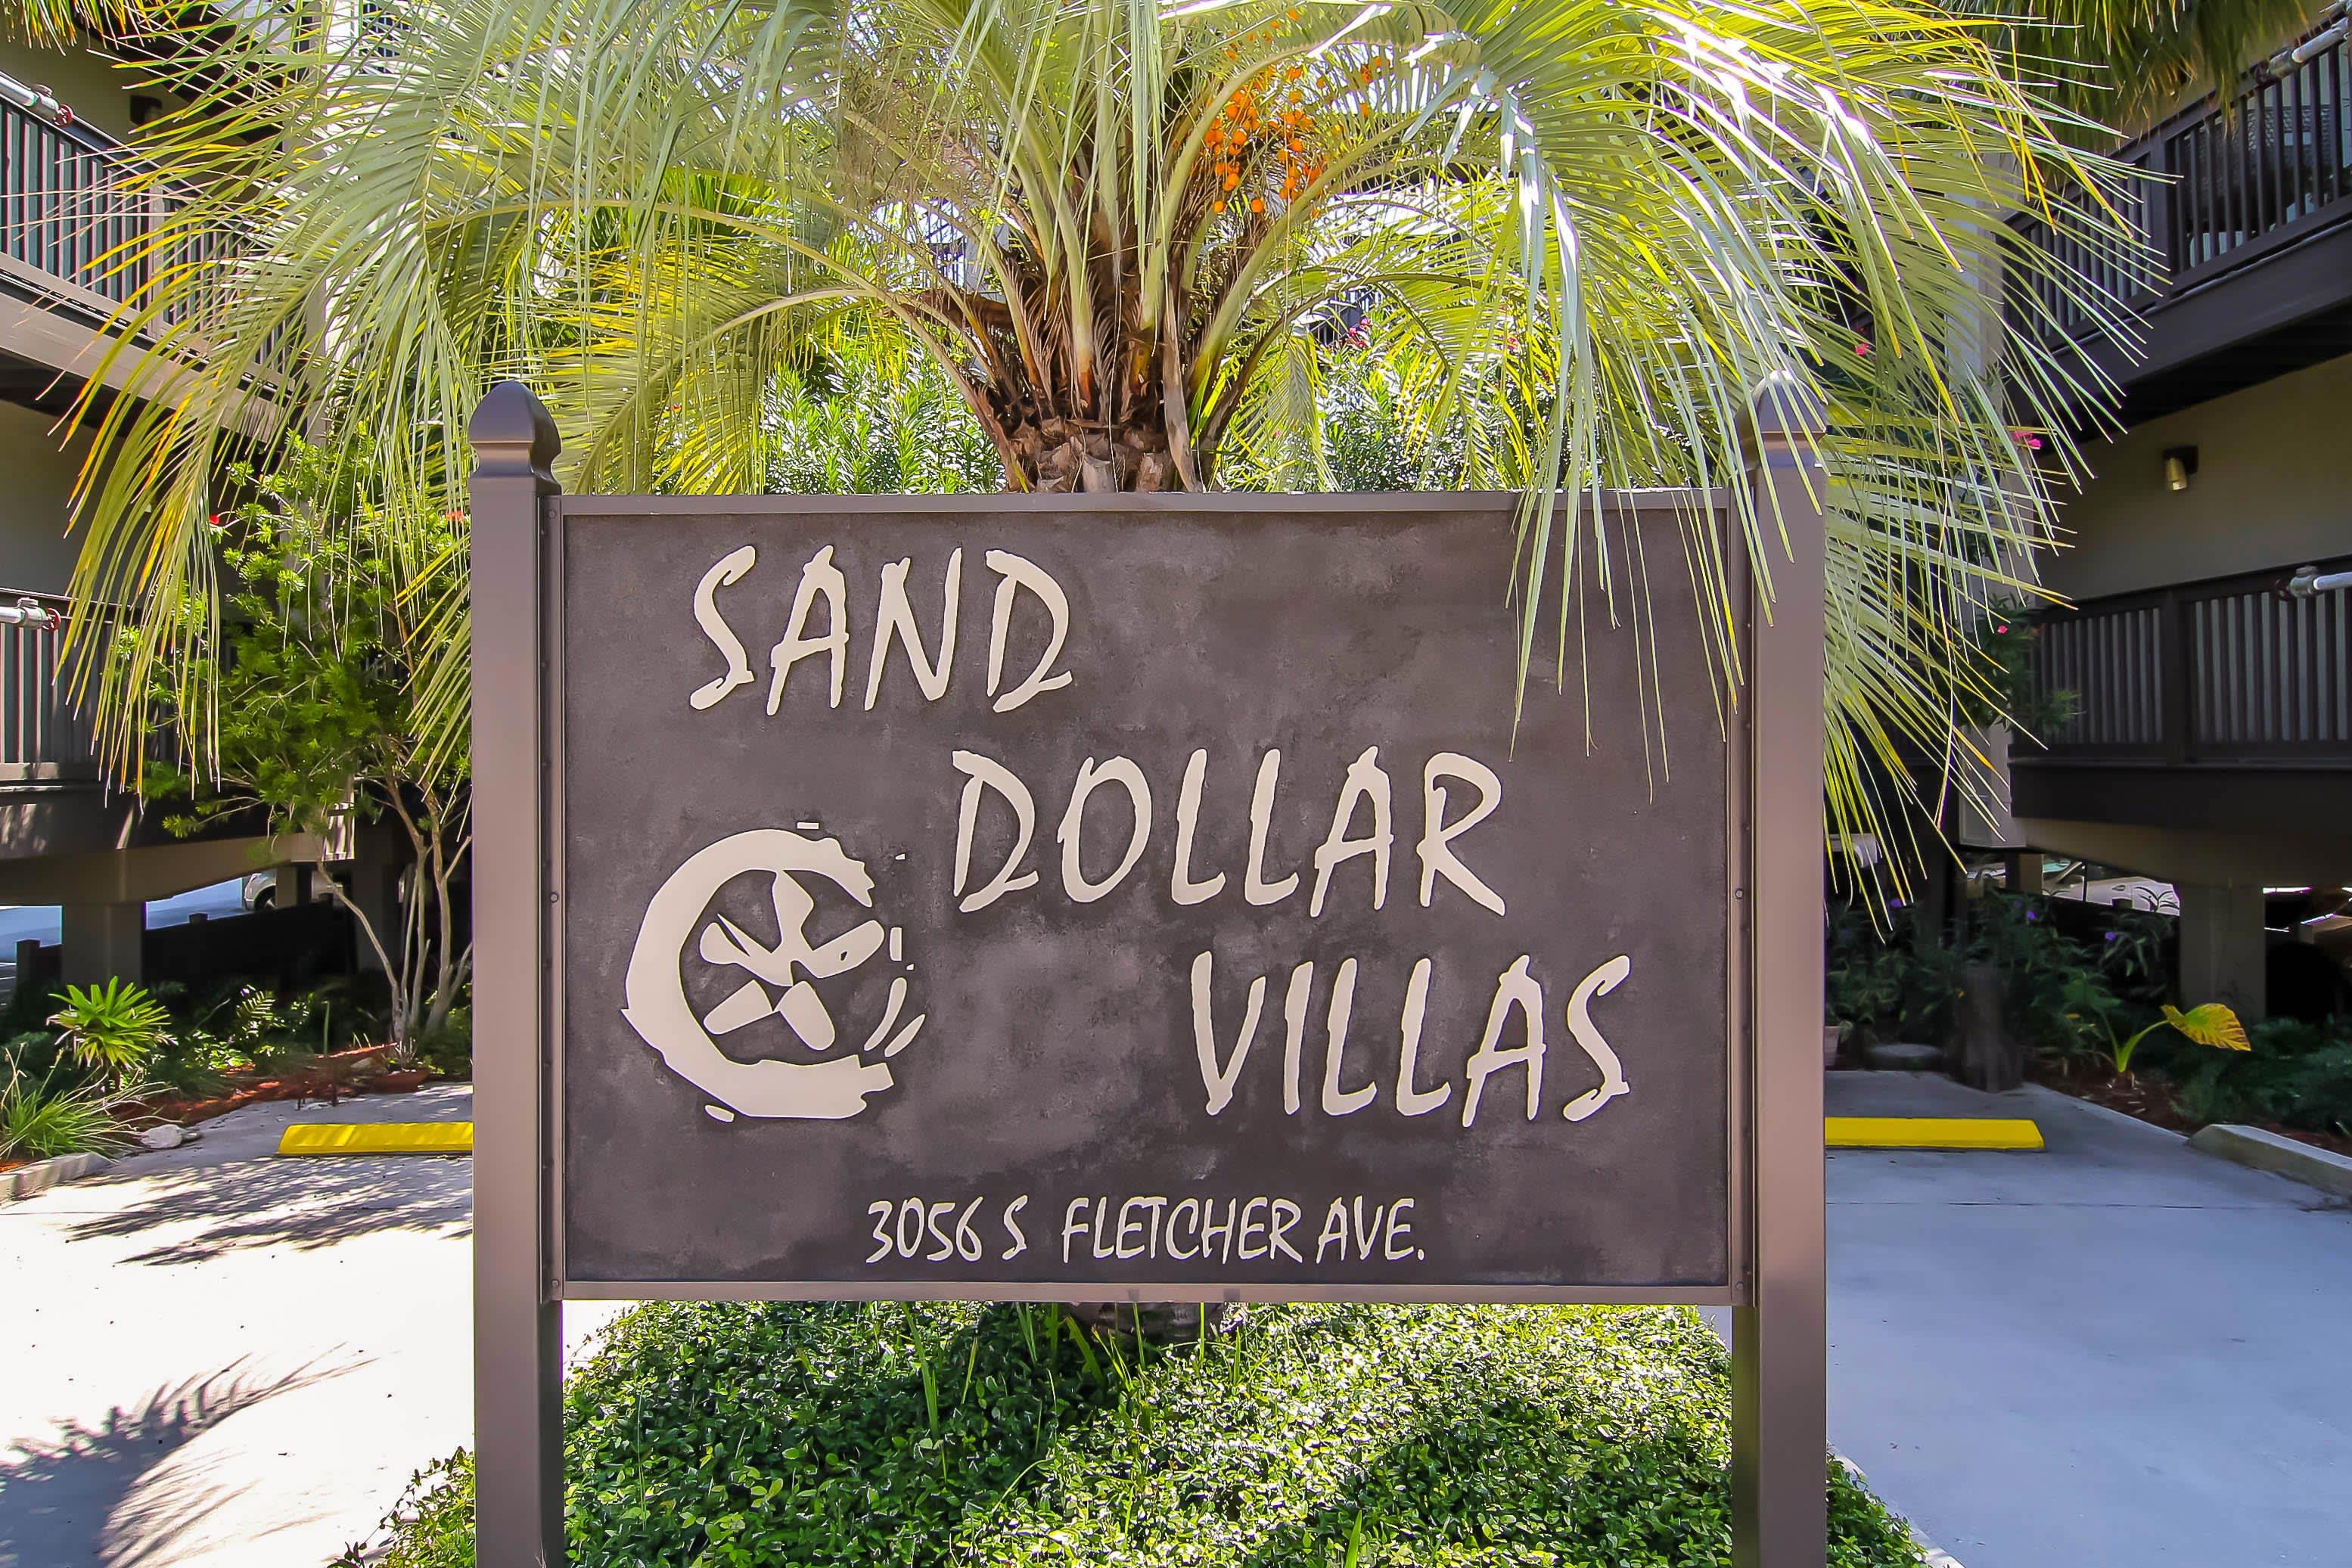 This villa is located in the Sand Dollar Villas resort.